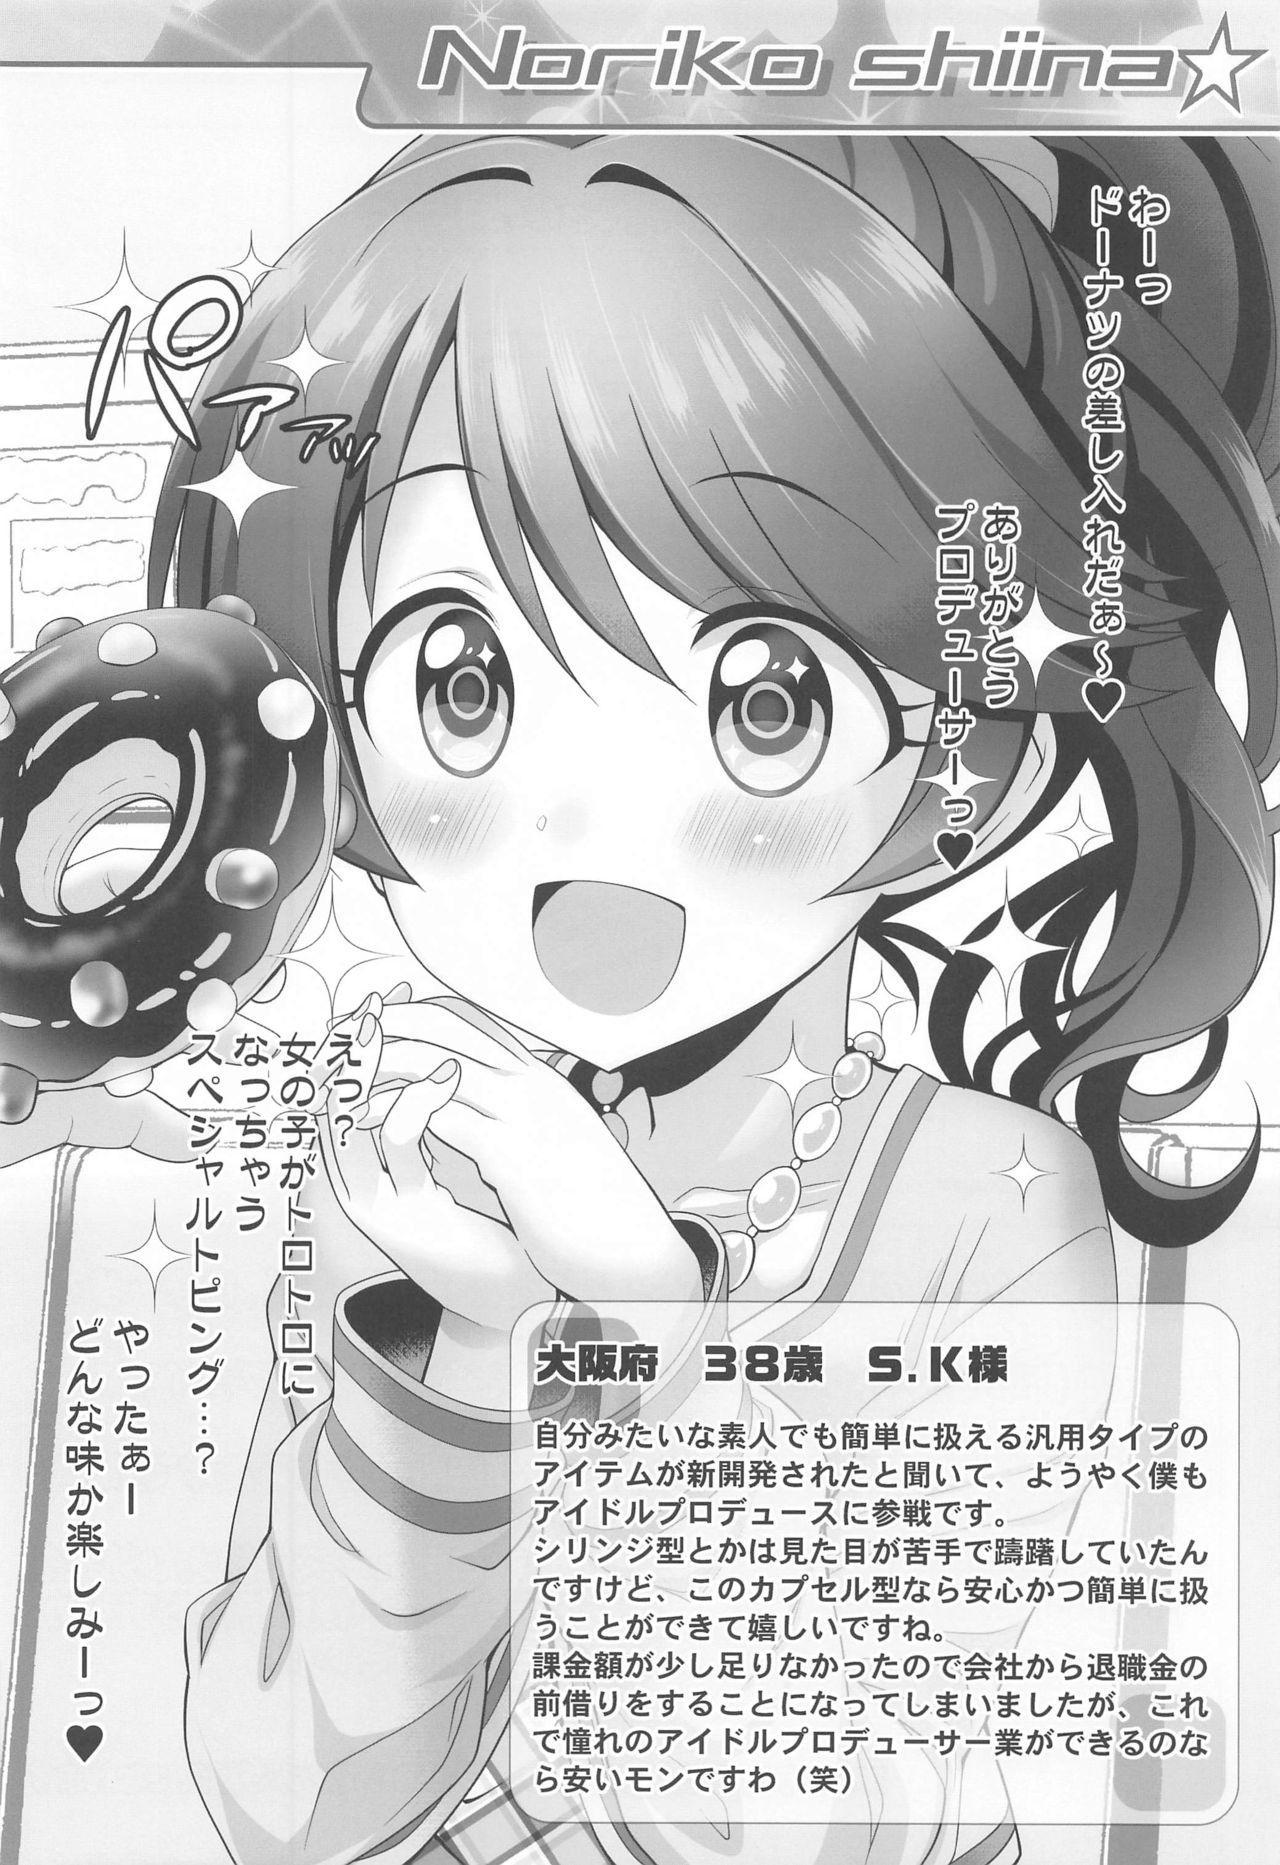 Platinum Okusuri Produce!!!! ◇◇◇◇ 4